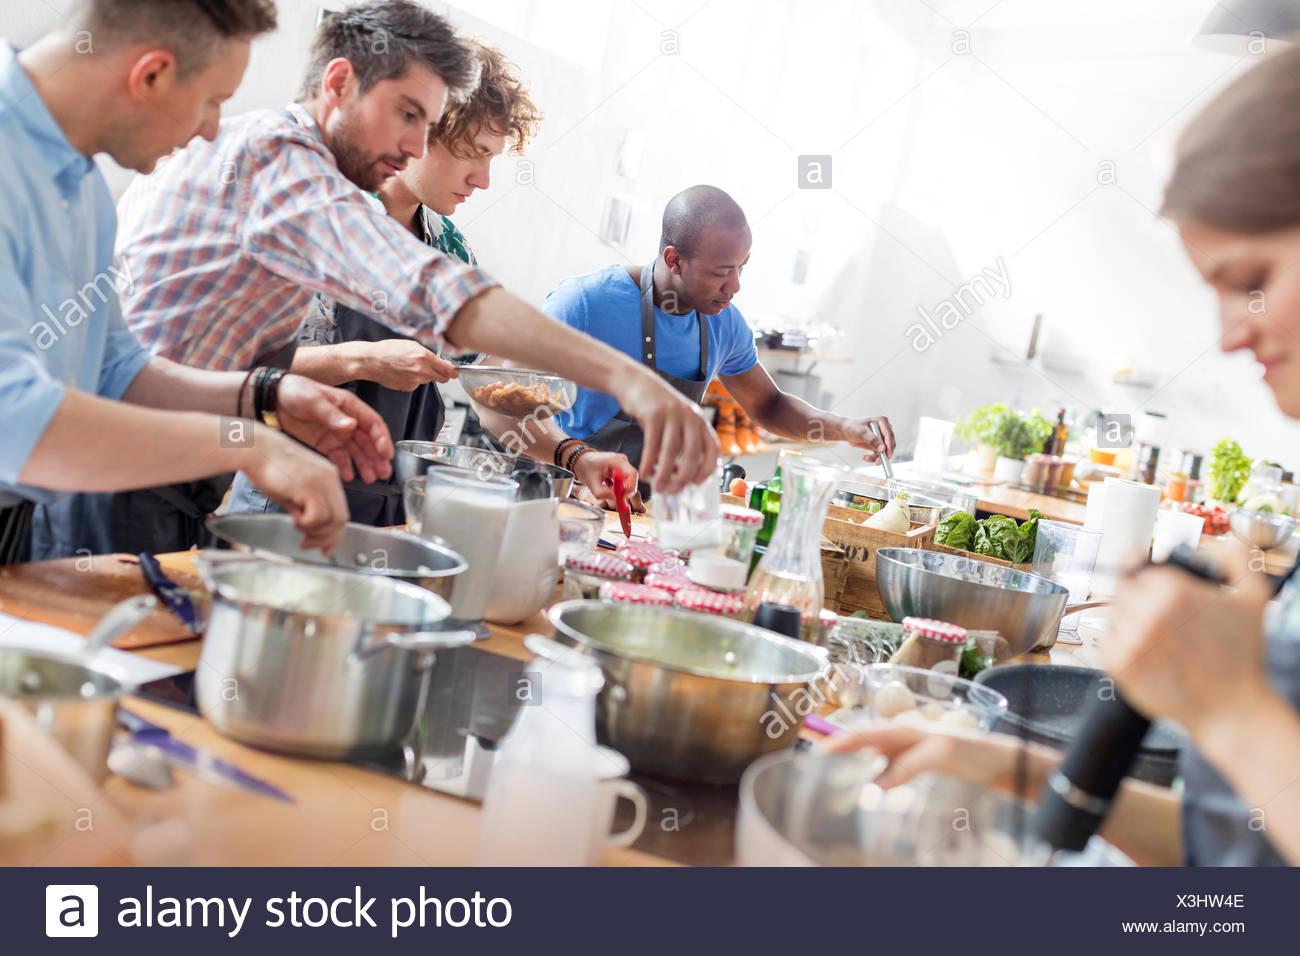 African Cooking Pot Stock Photos & African Cooking Pot Stock Images